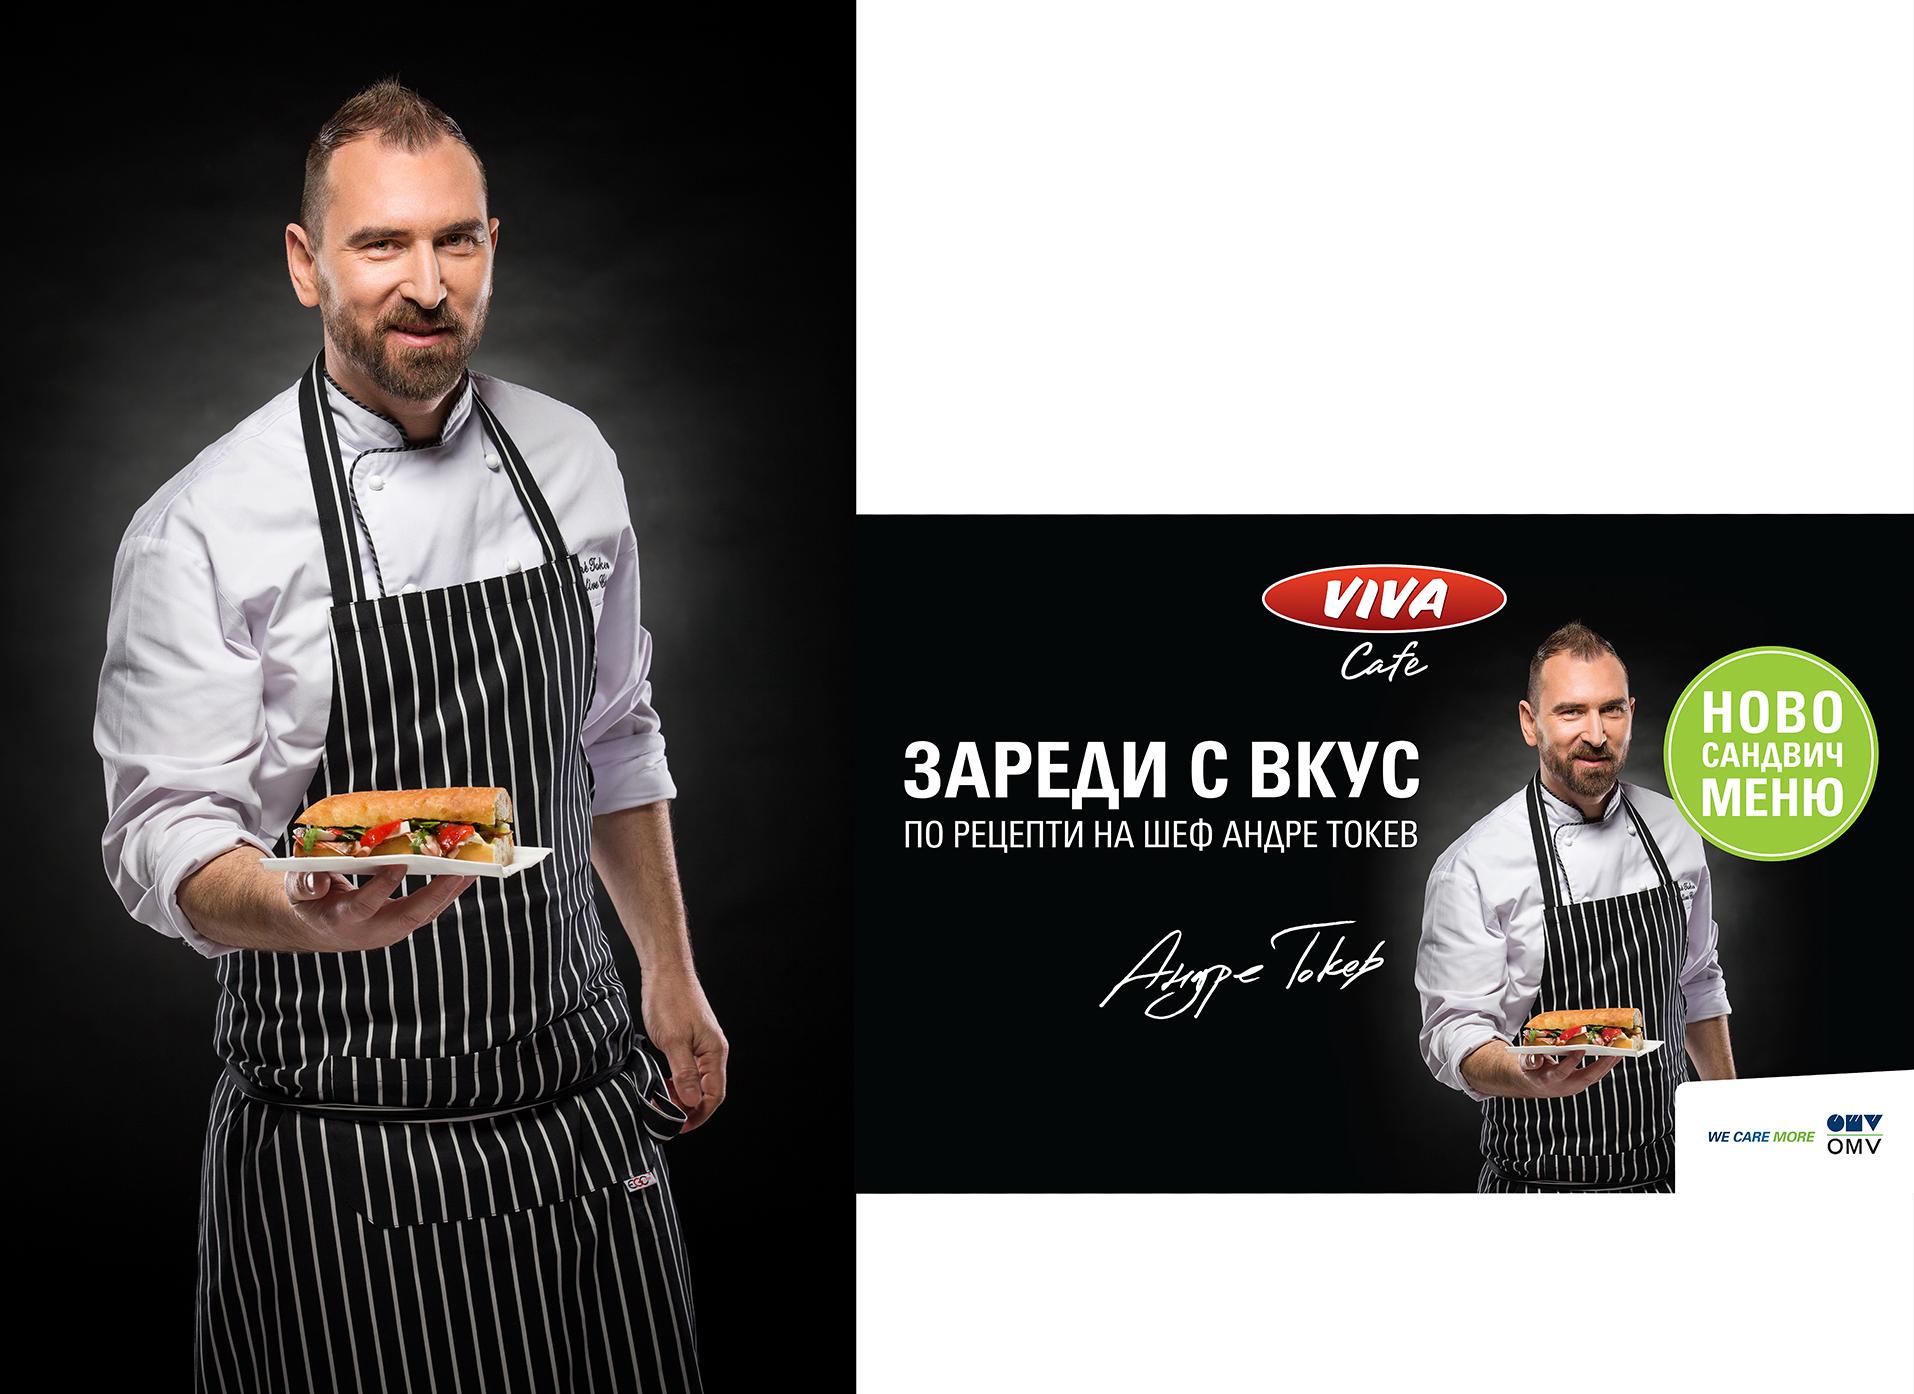 Andre Tokev OMV